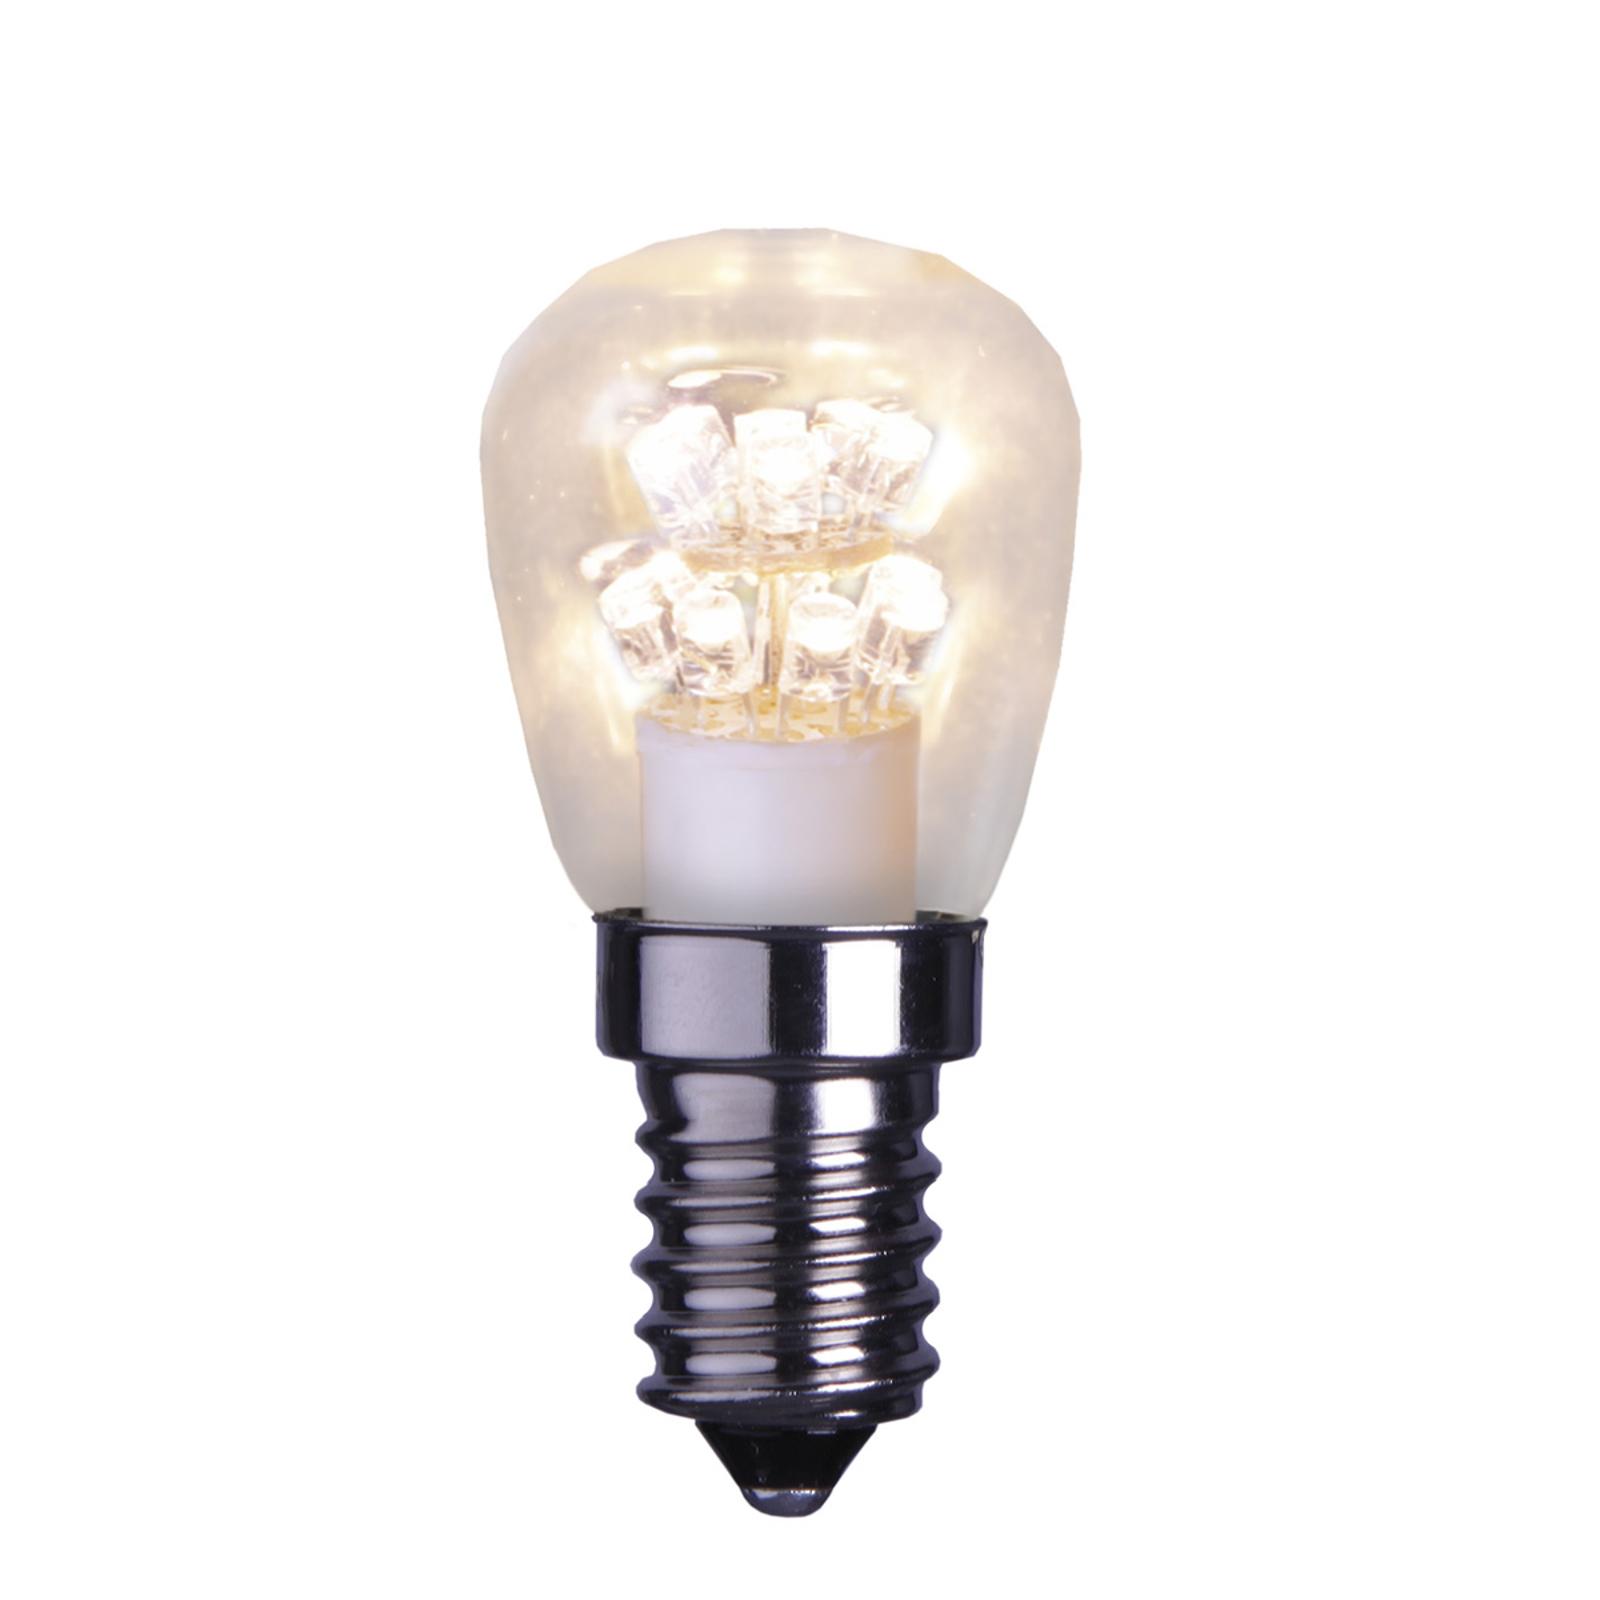 E14 0,7W klar LED-lyspære, varmhvitt lys (2100 K)